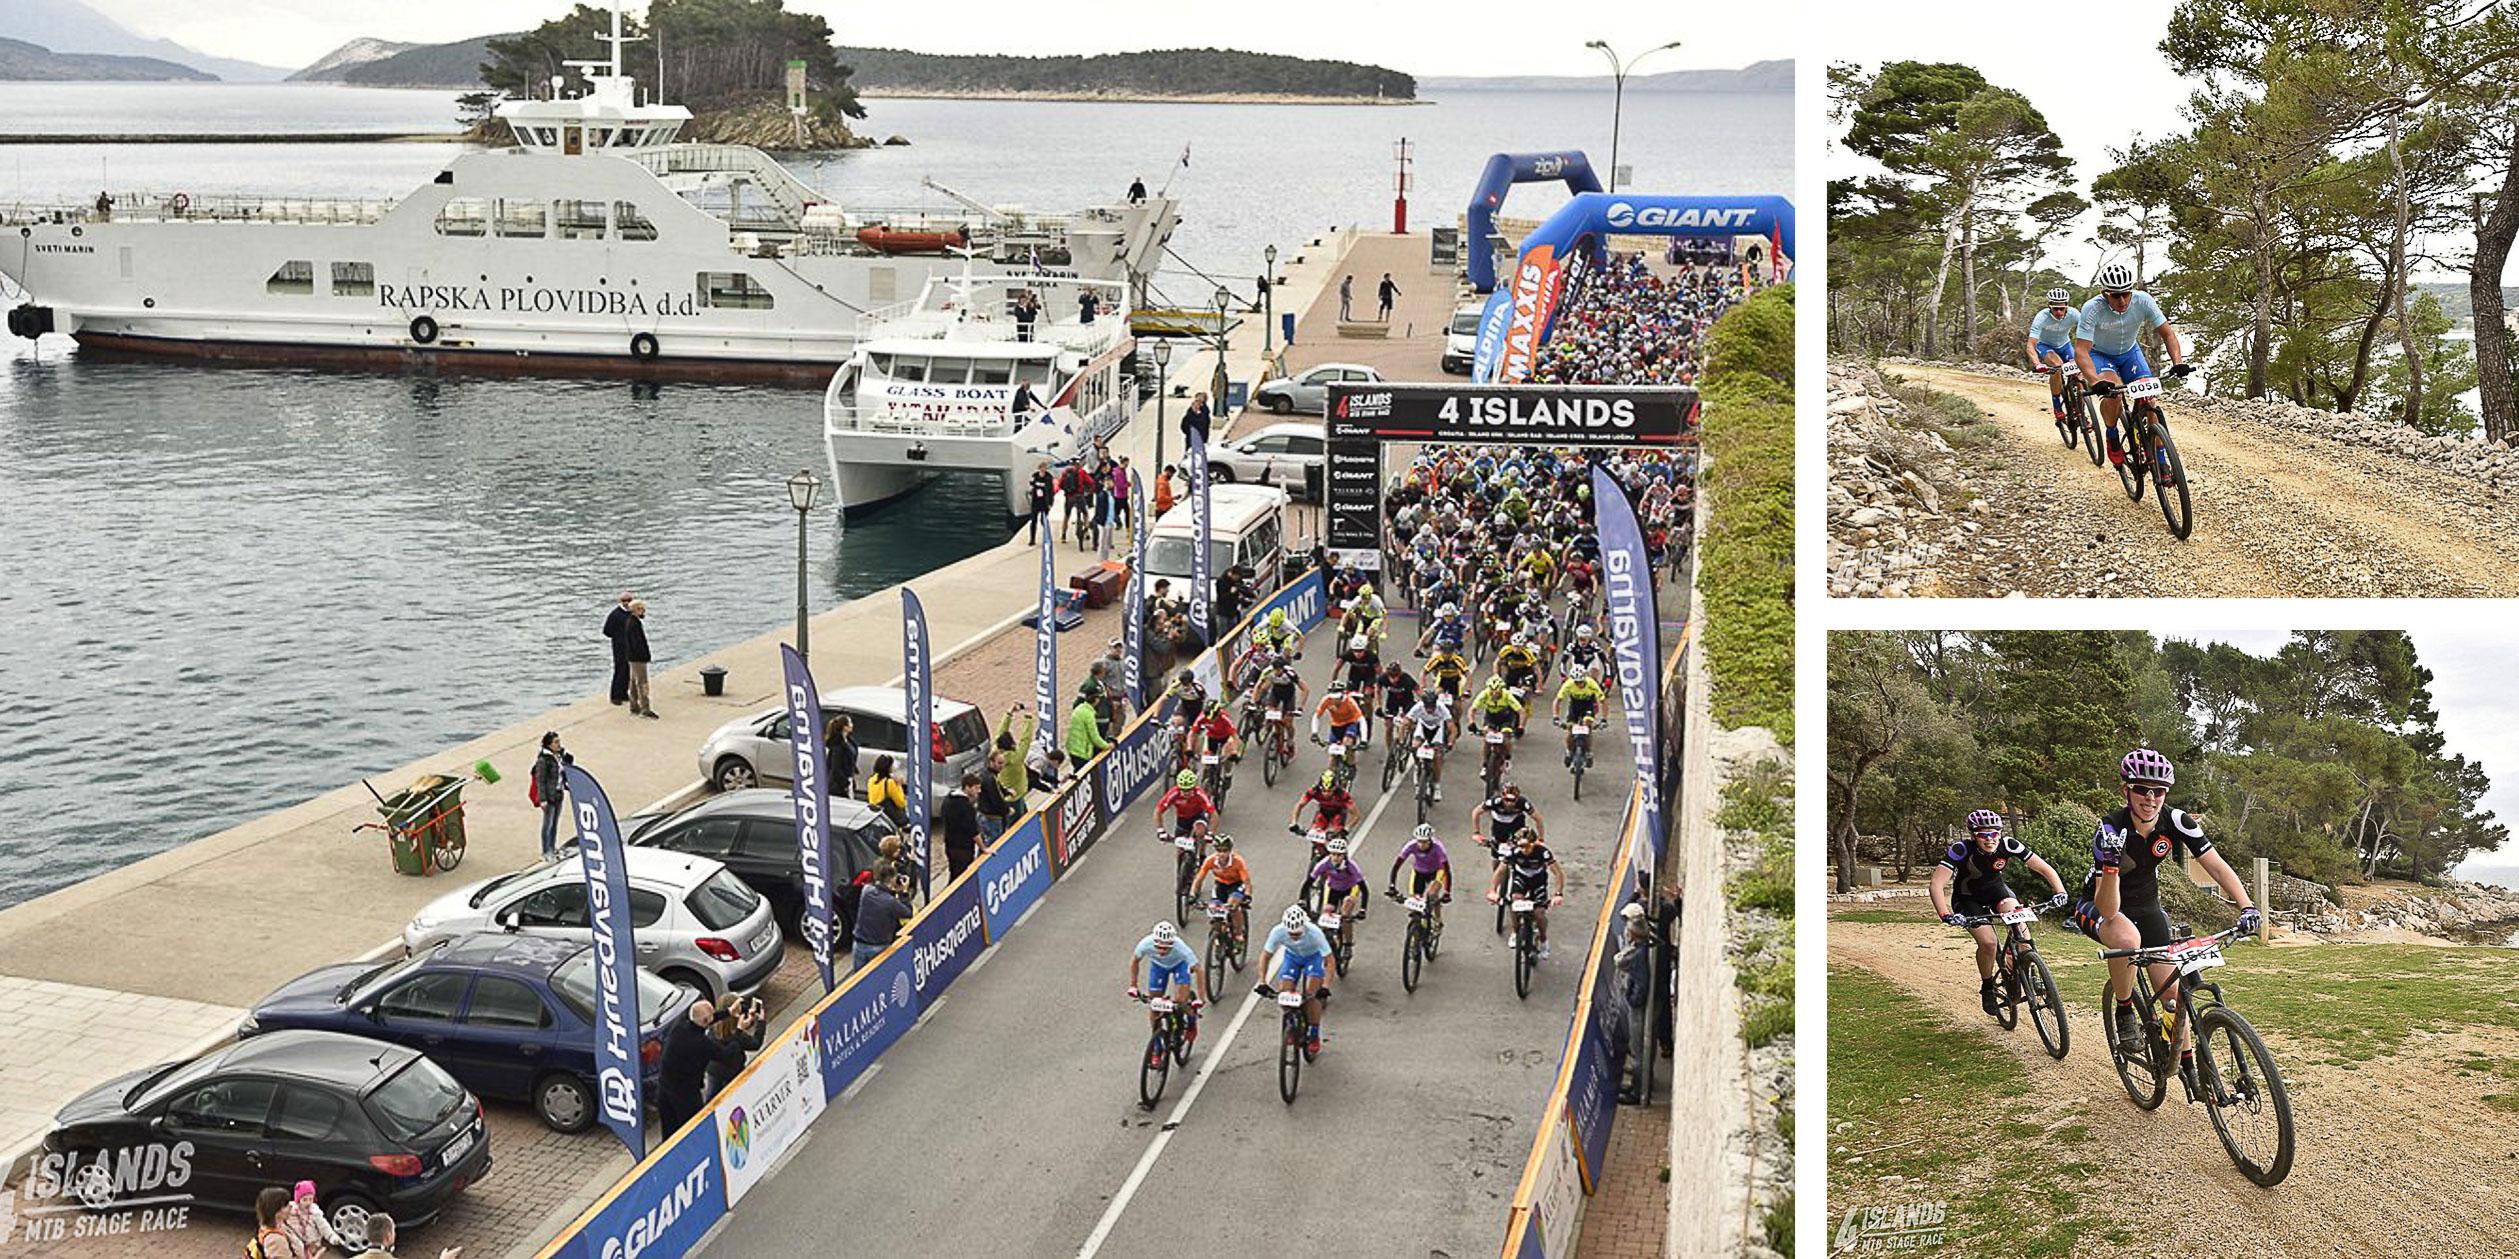 8-Day2-4Islands_MTB_Copyright_Sportograf_VojoMag-1